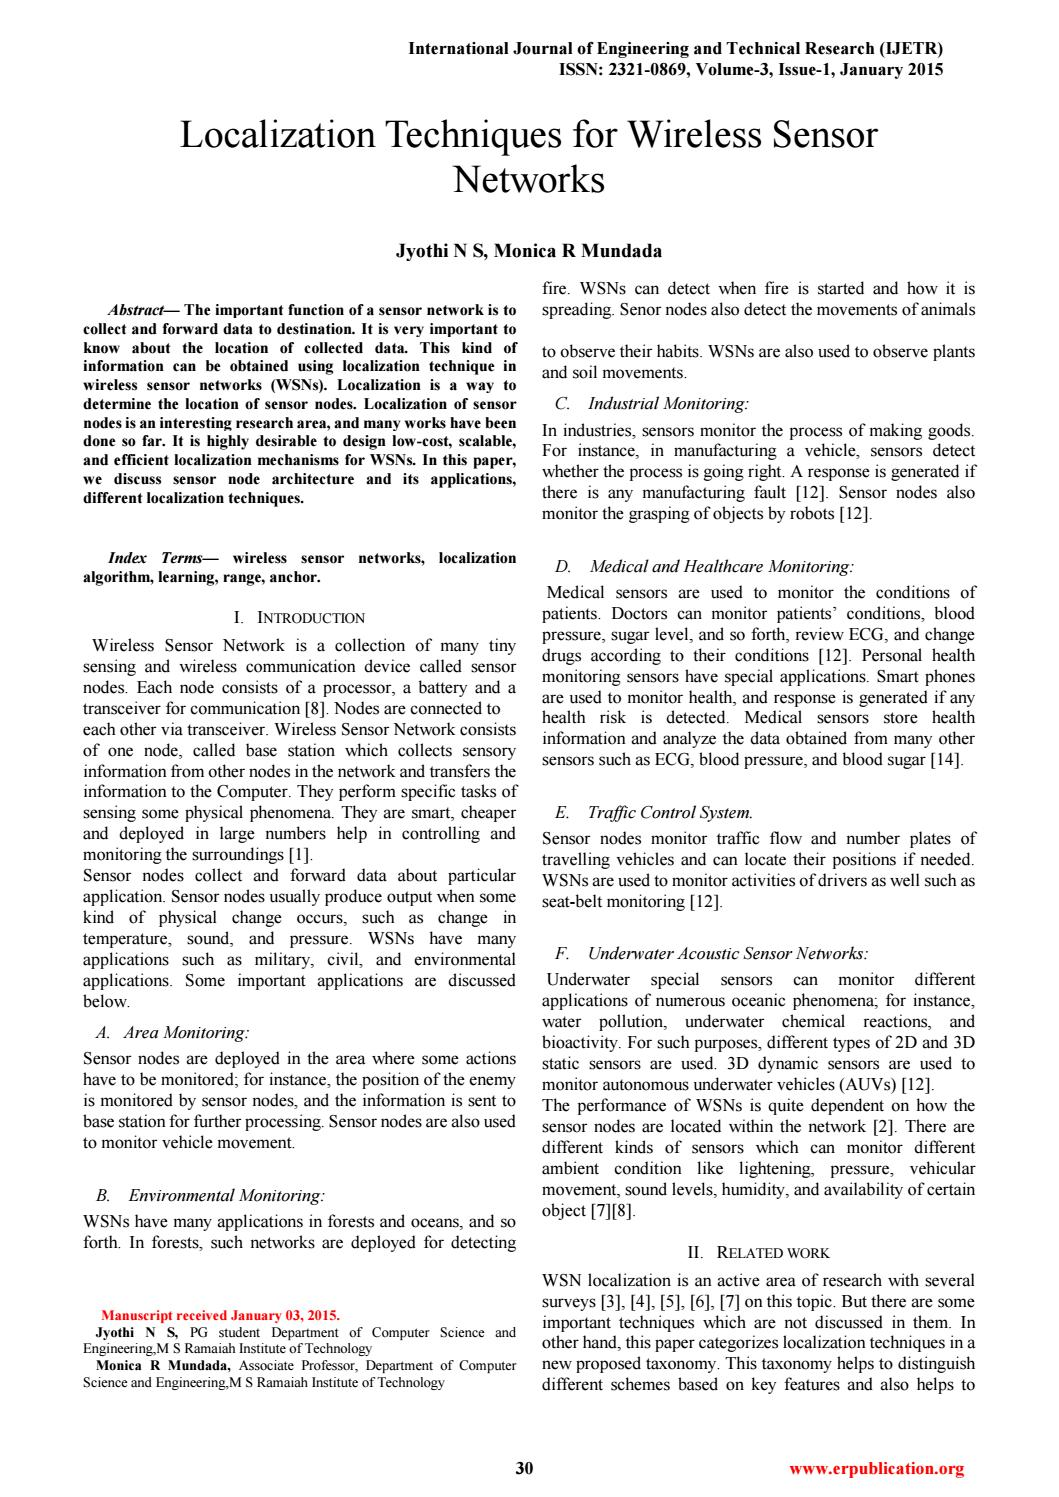 Ijetr031118 by anilkasot - issuu